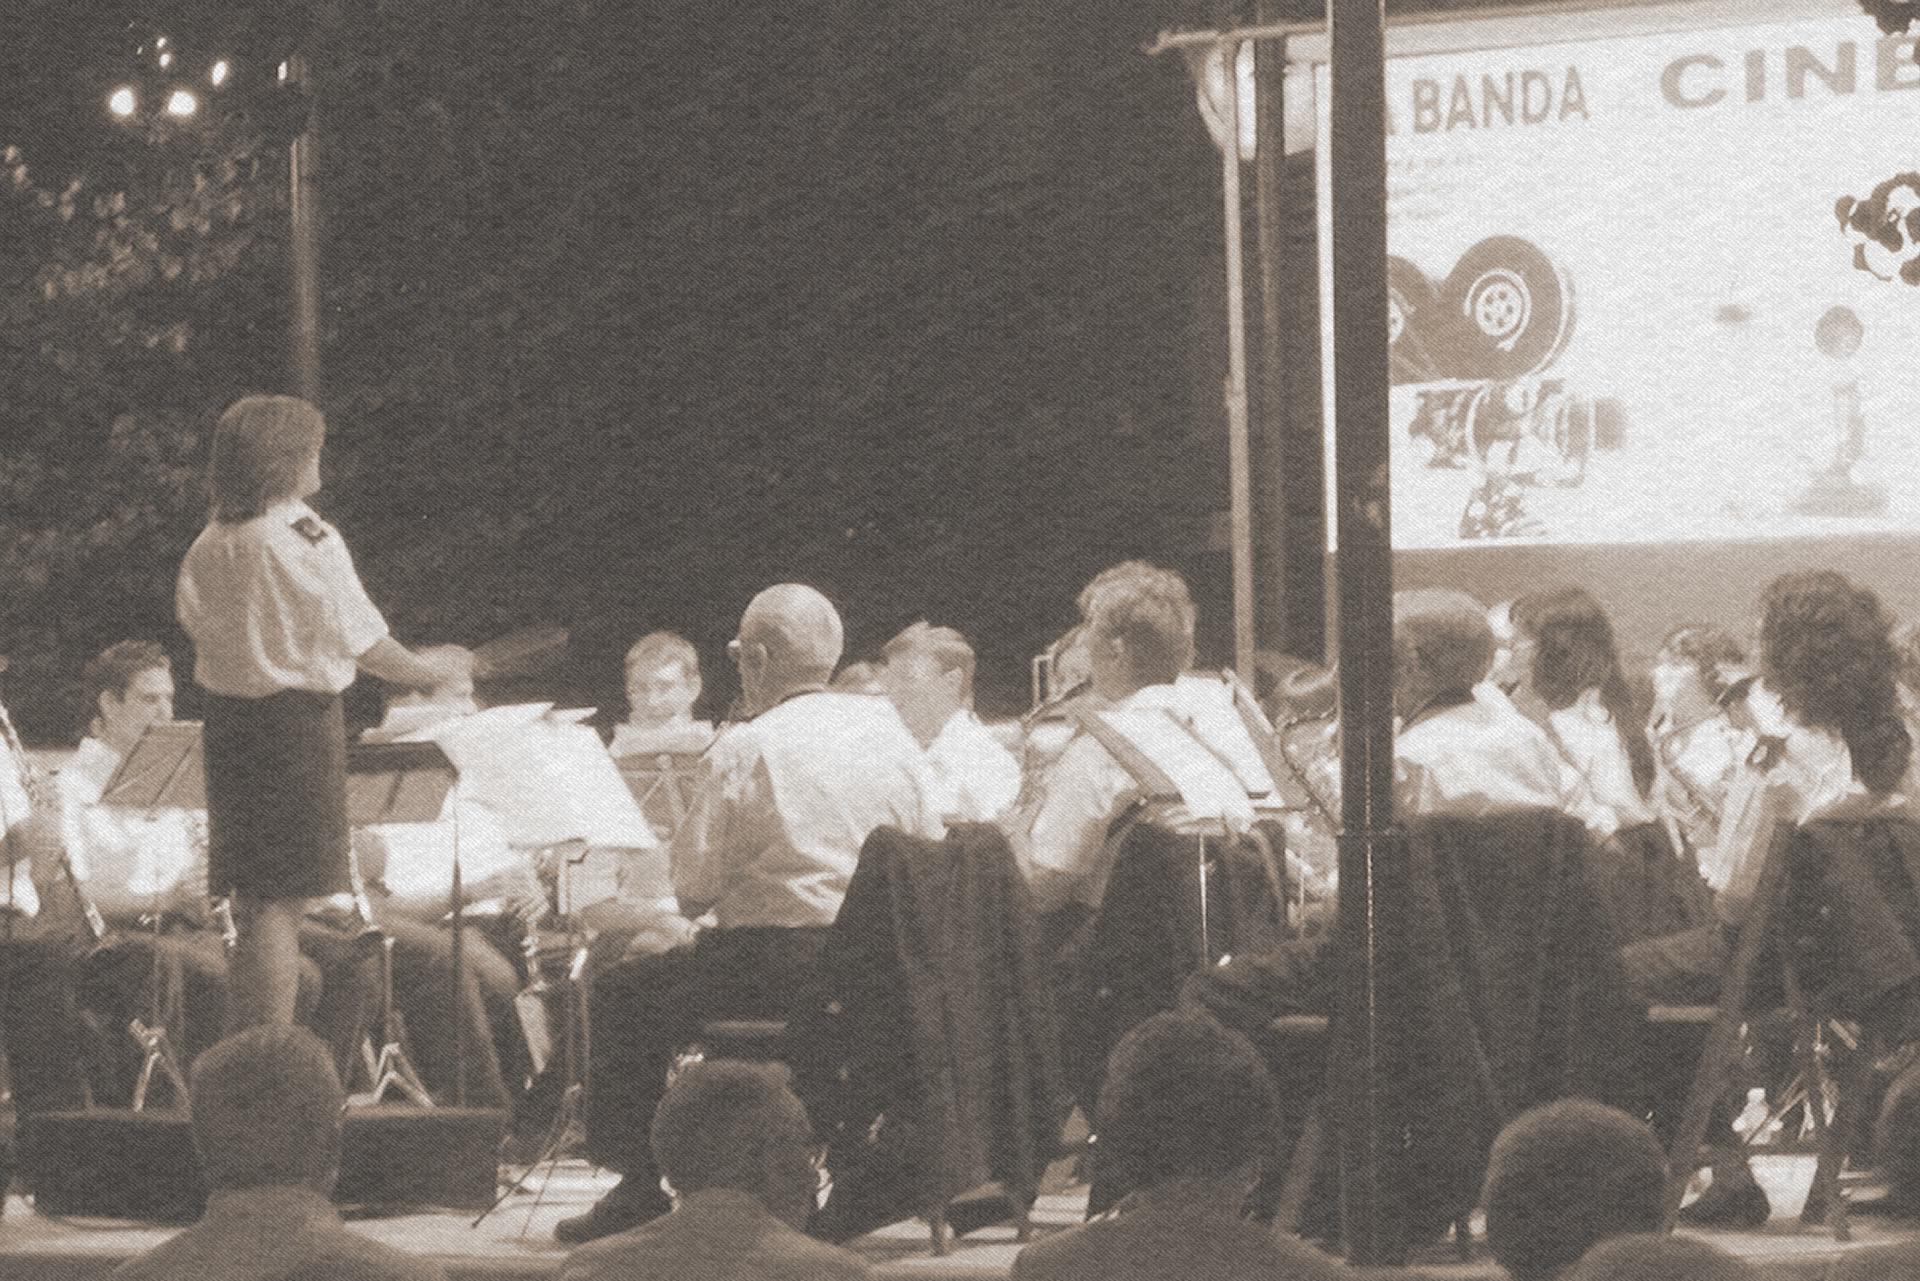 Presentación de Rebambalancha en La Bañeza